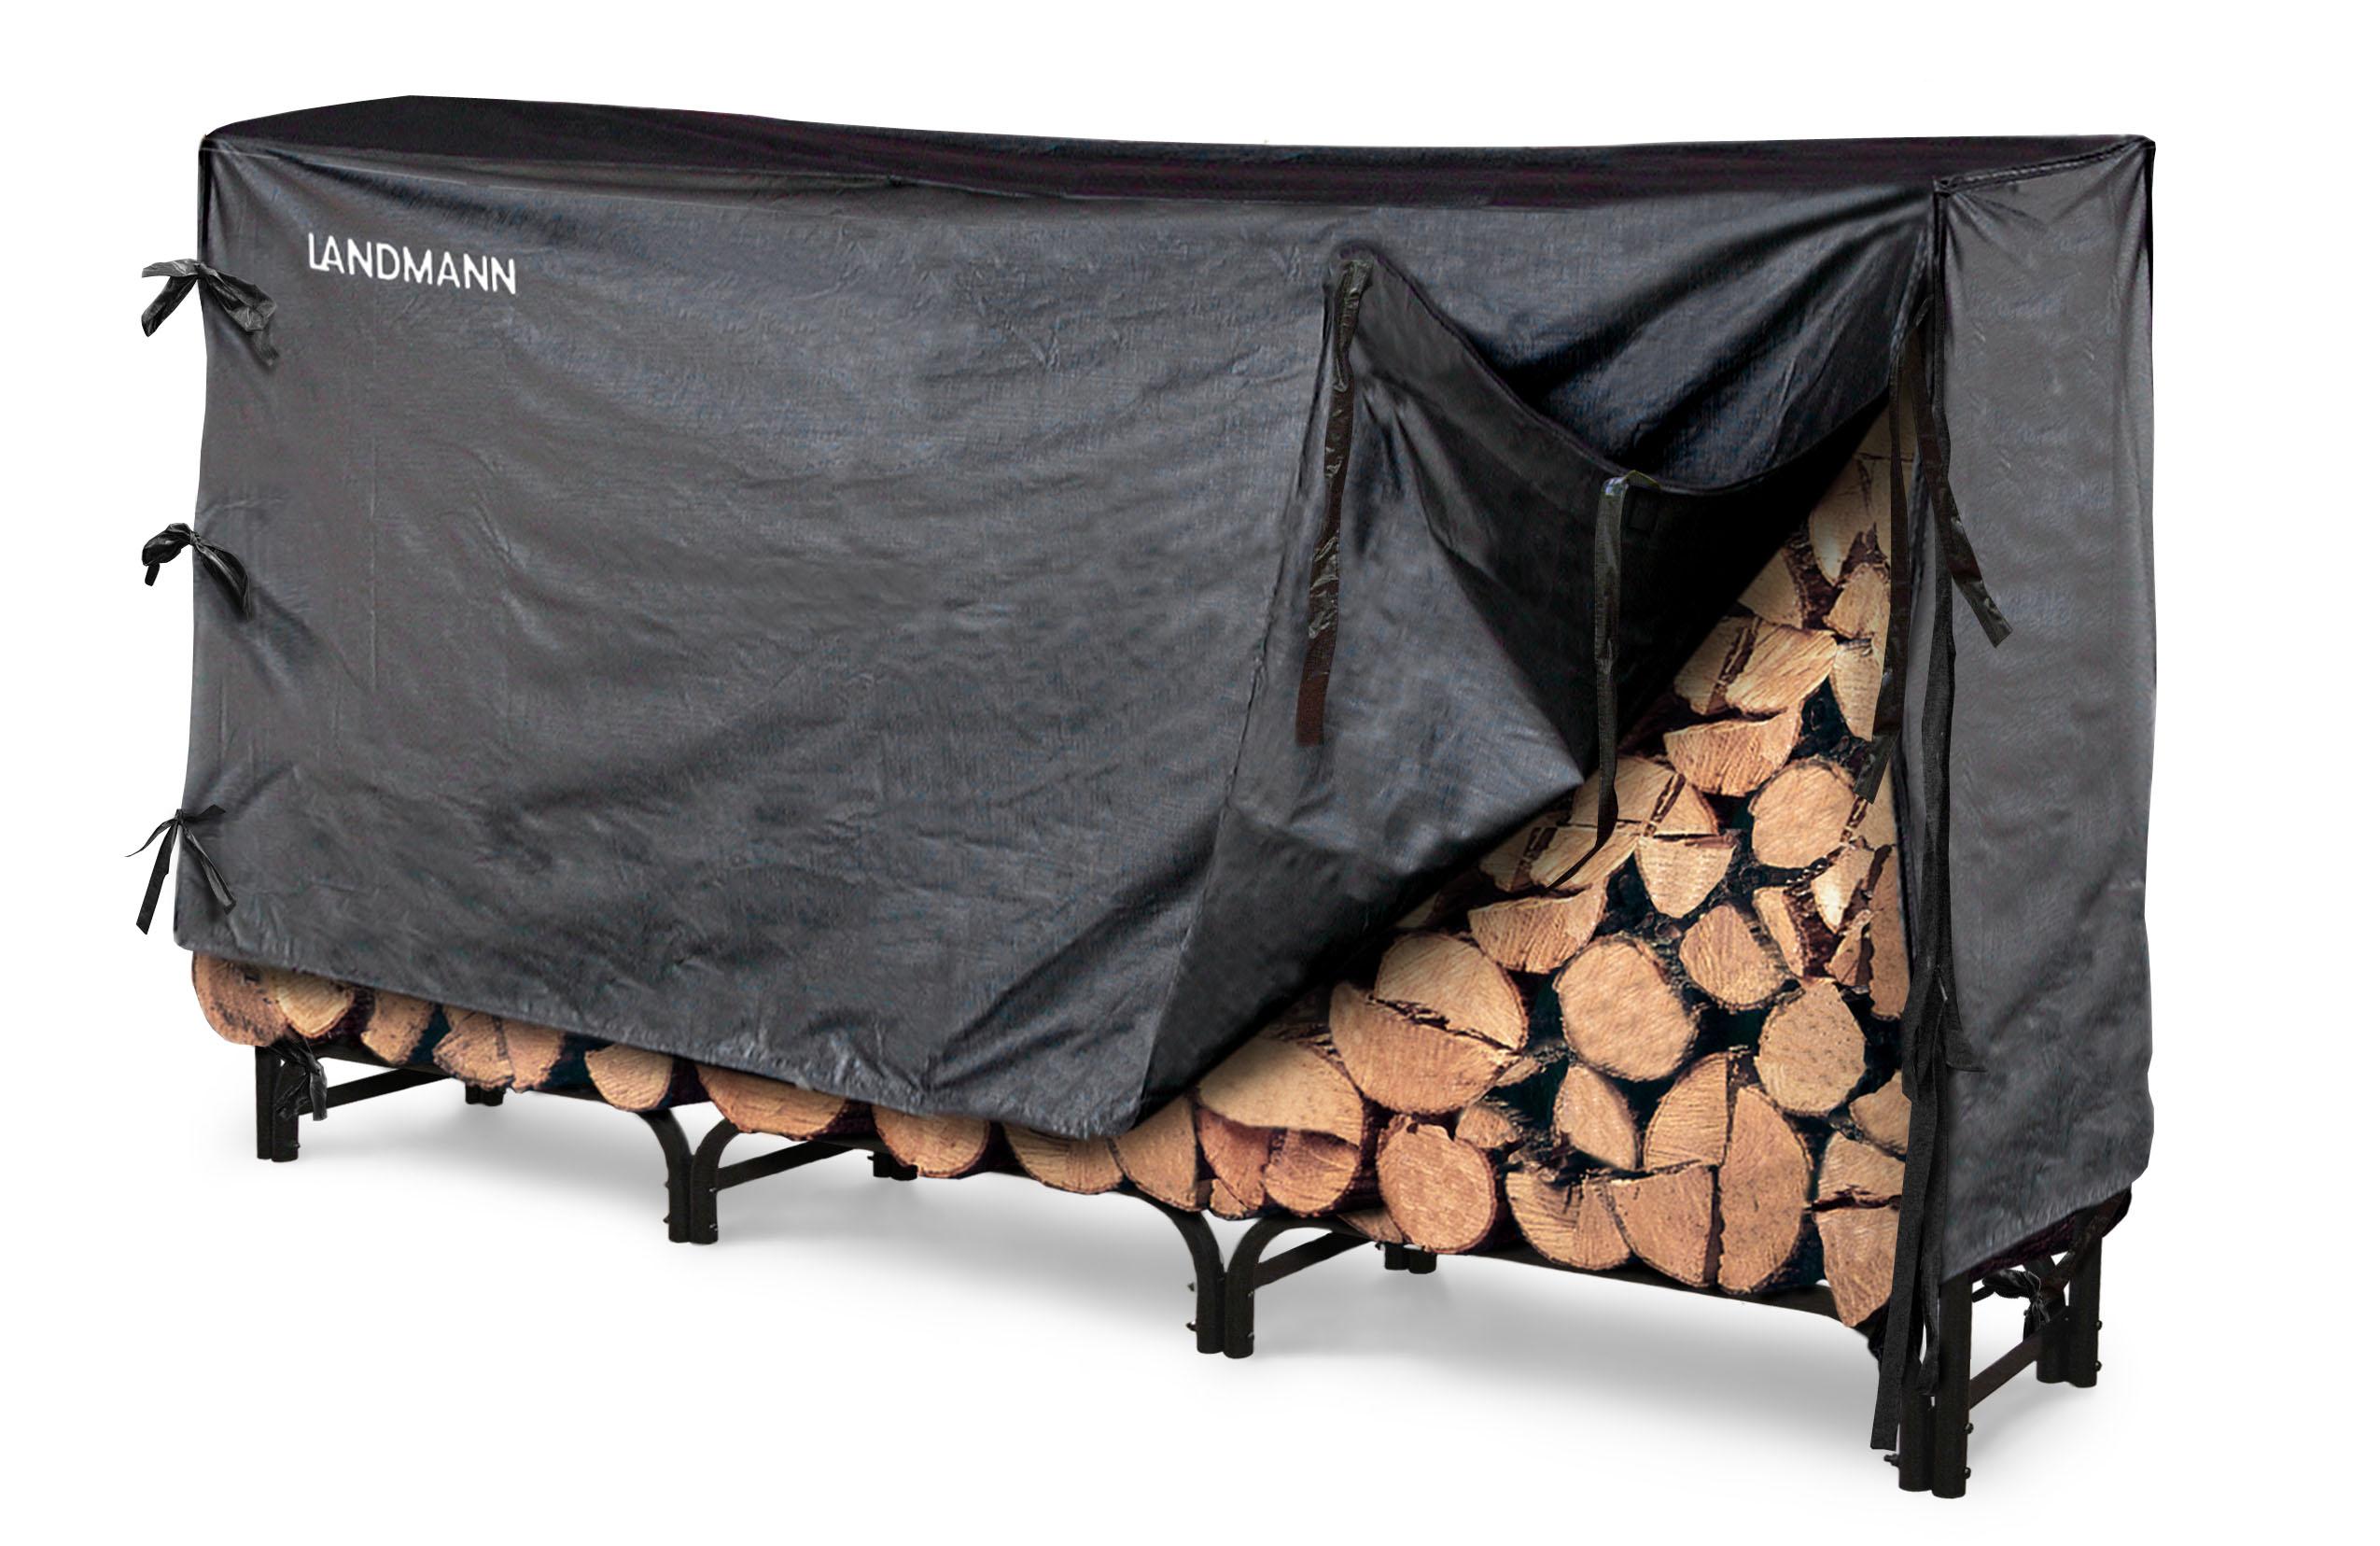 Landmann 8 Firewood Rack W Cover 32mm Tube And 1 0mm